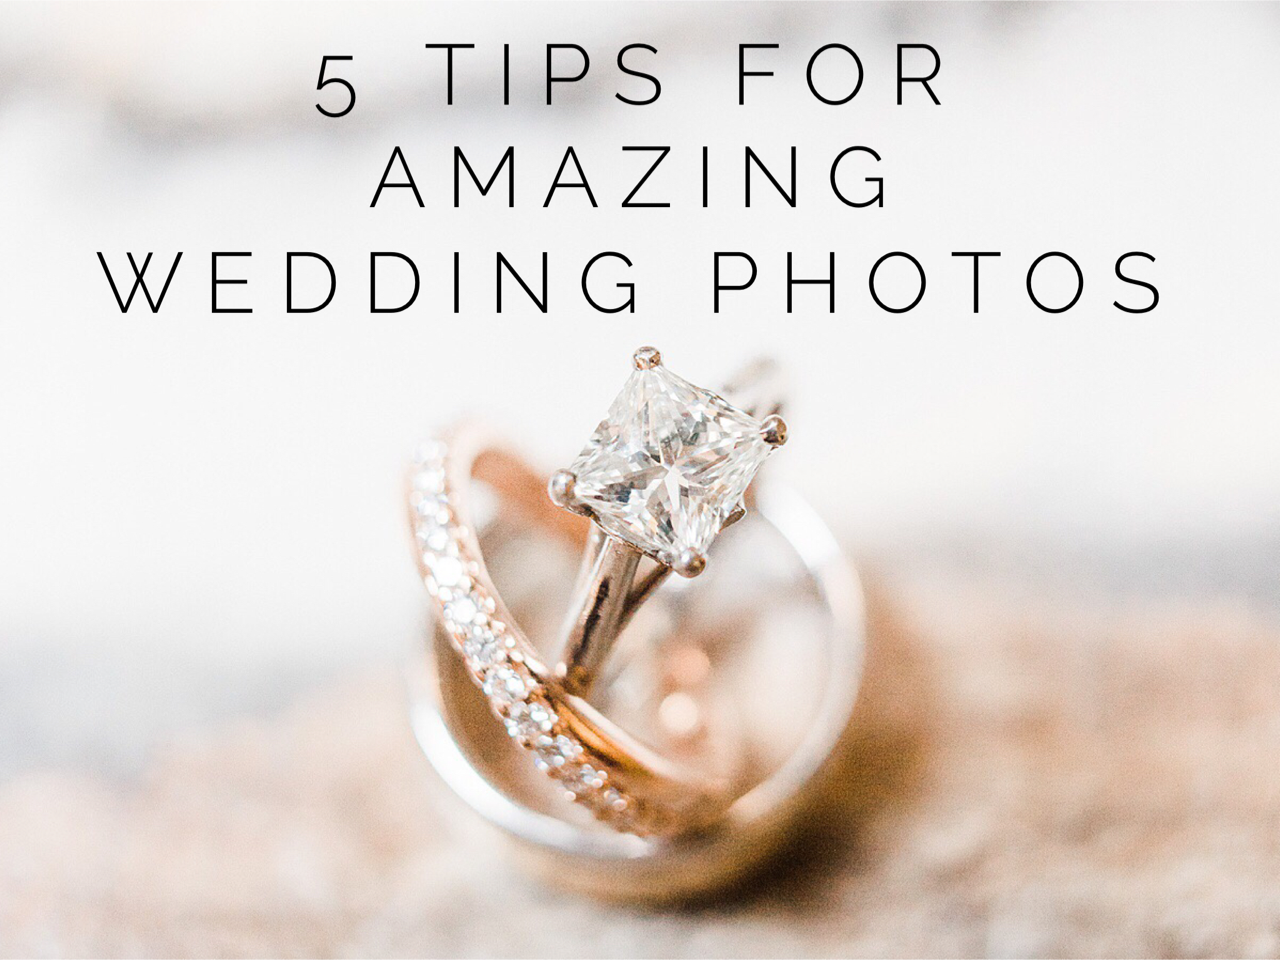 5-tips-for-amazing-wedding-photos.jpg